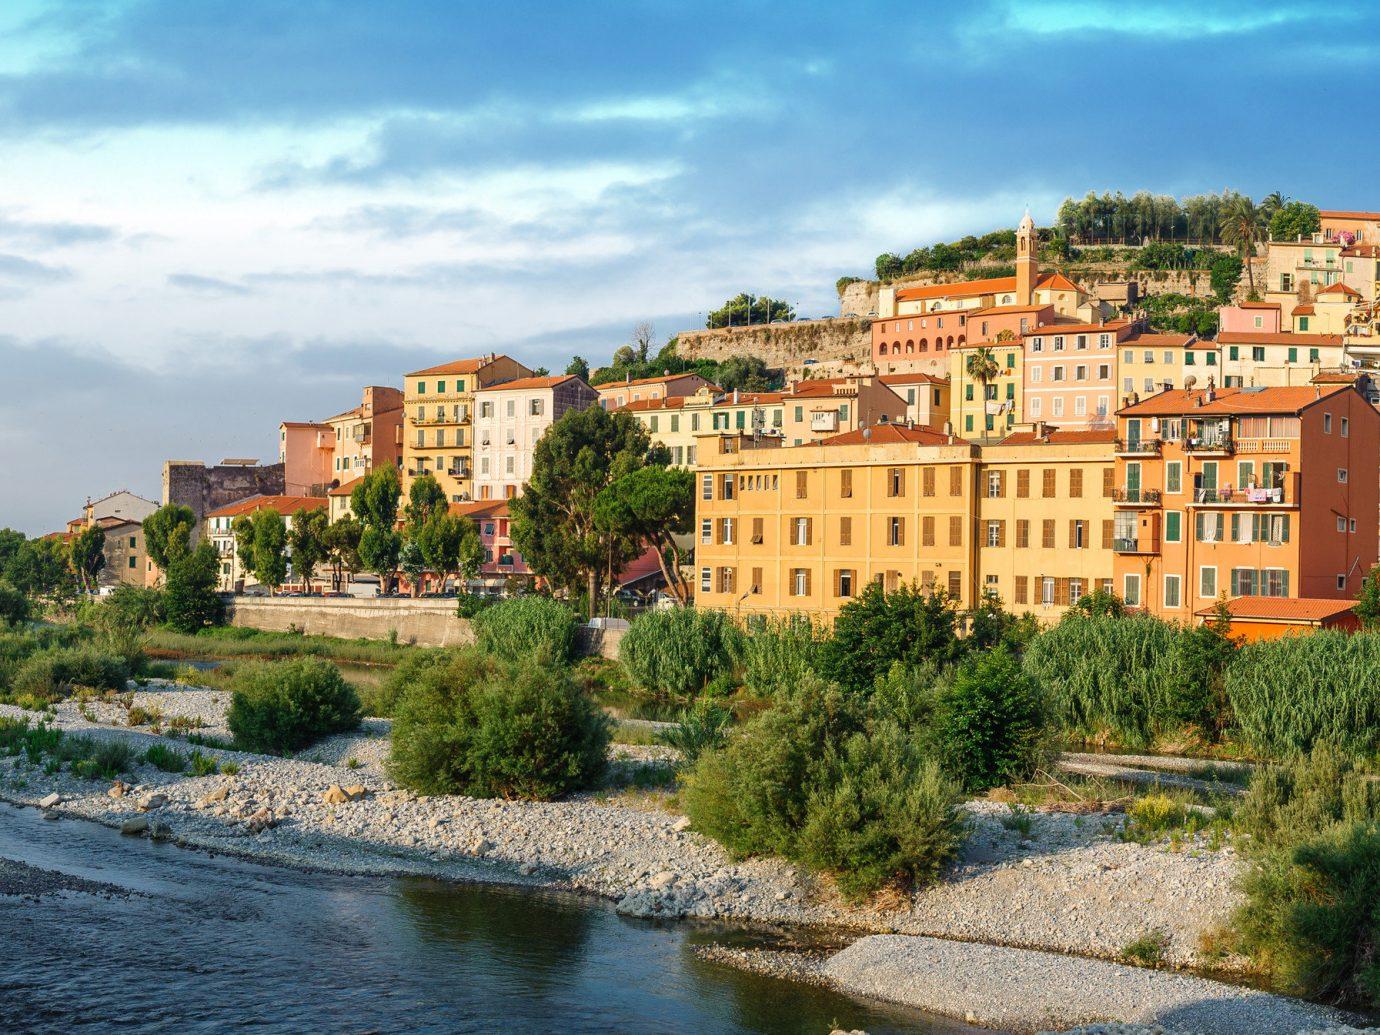 Italy Trip Ideas City sky Town tourism real estate Village panorama tree Coast building cityscape River facade